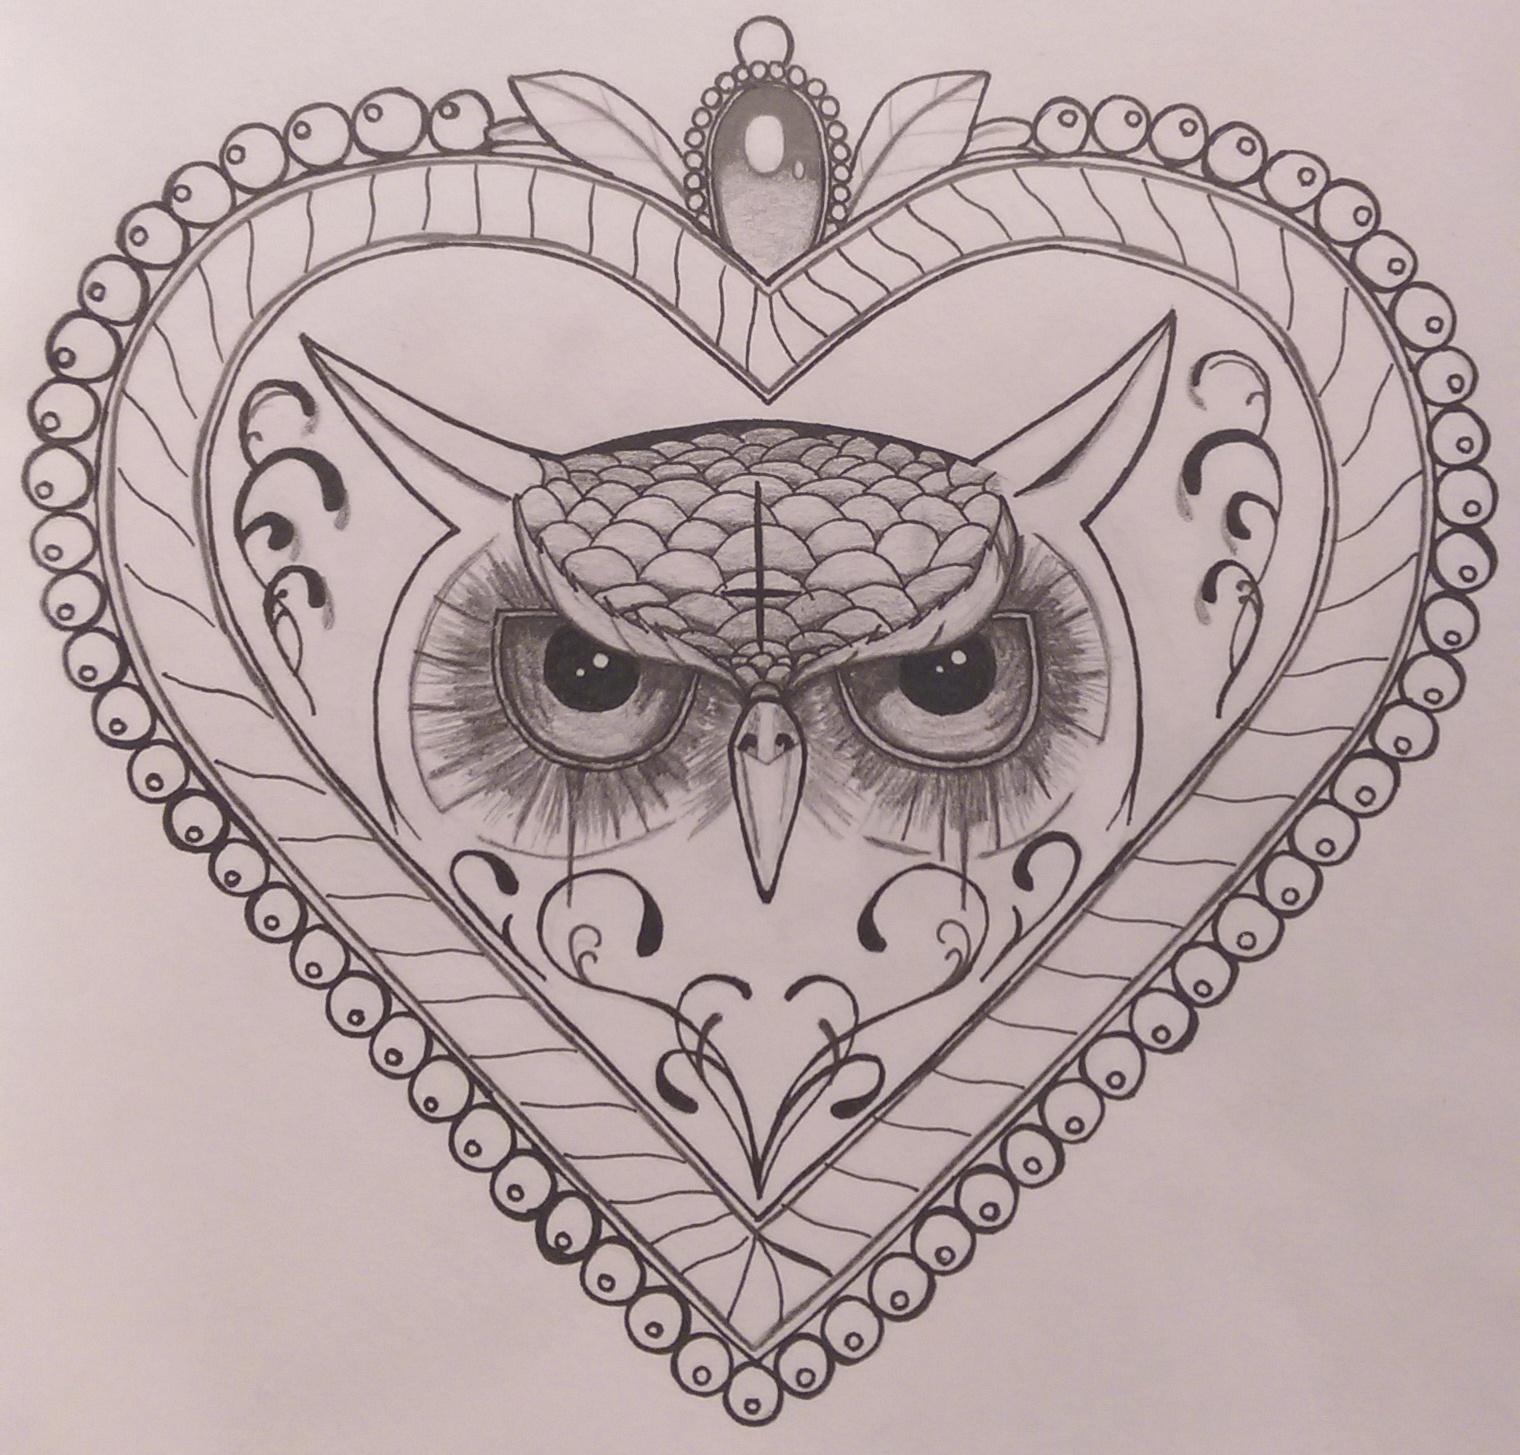 Sweet drawn owl head in heard frame tattoo design